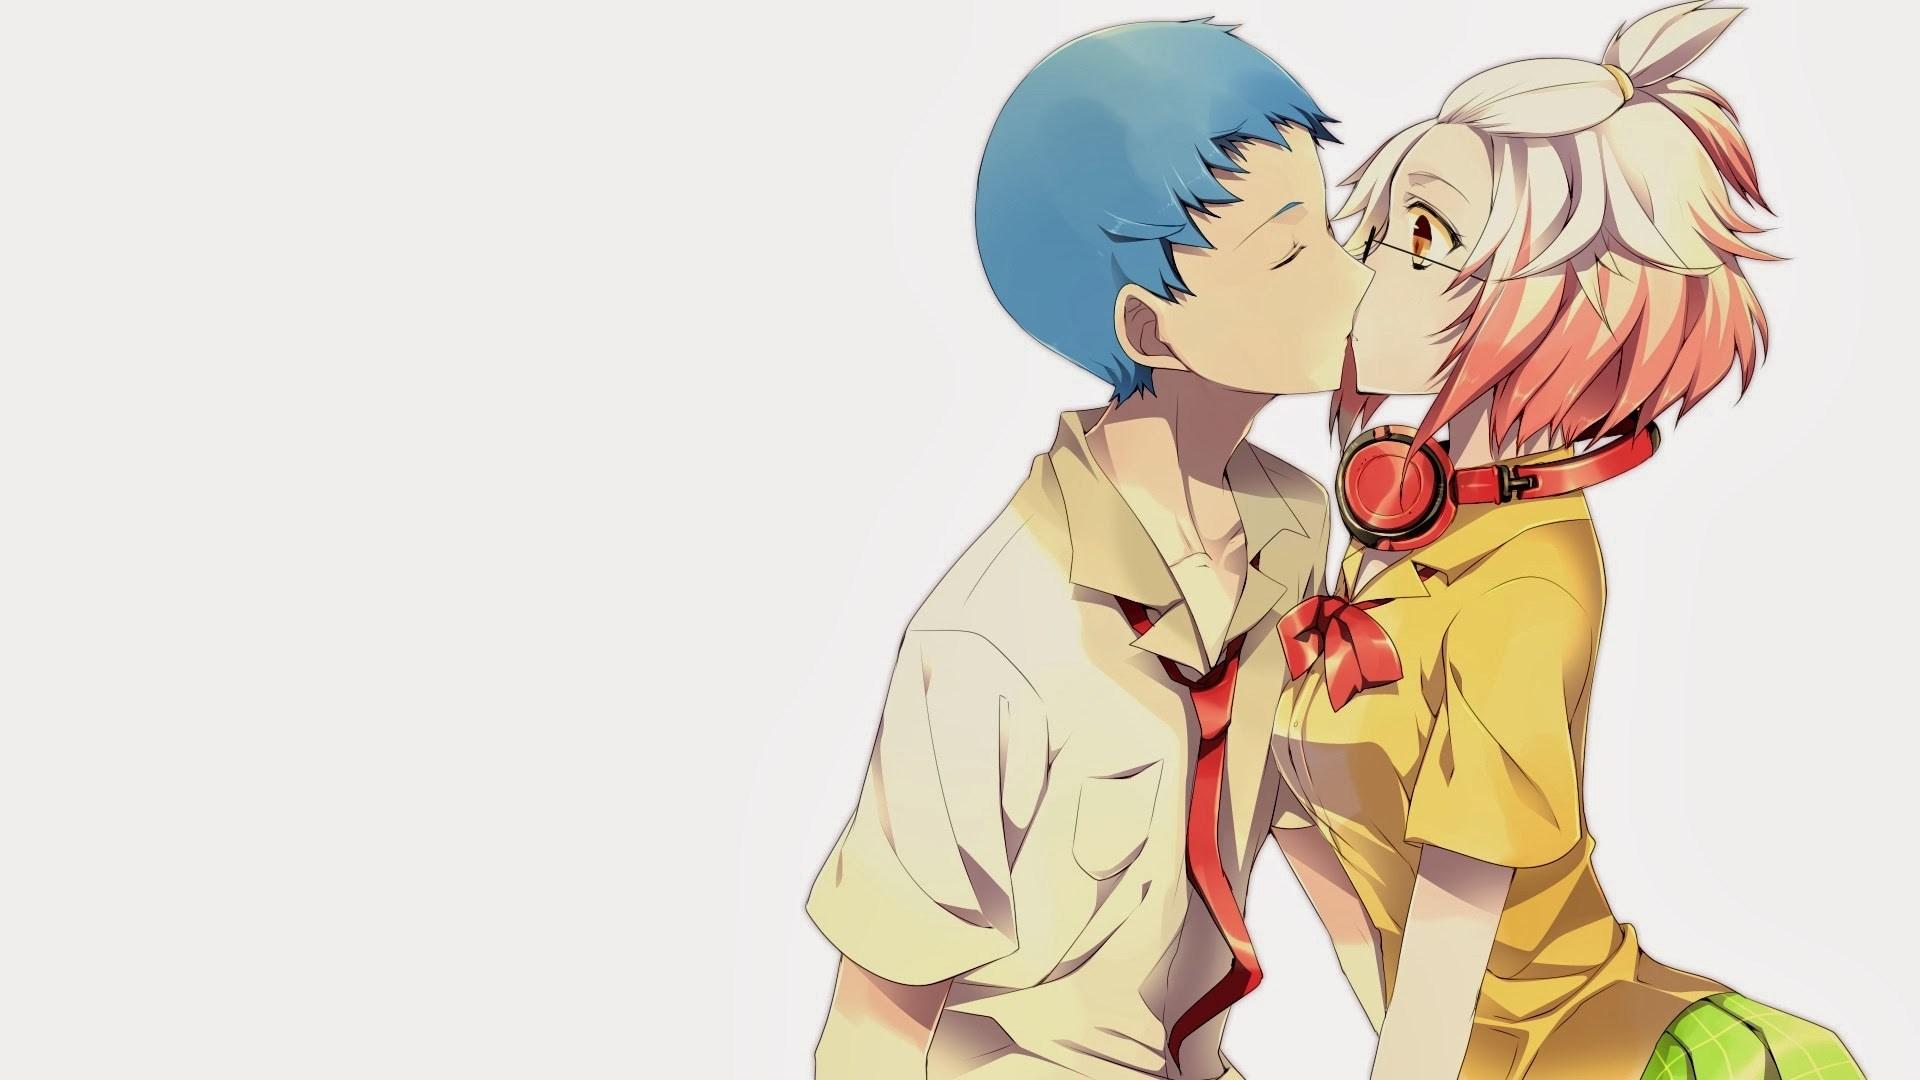 anime-couples-image-widescreen-retina-imac-1920-x-1080-kB-wallpaper-wp3602532